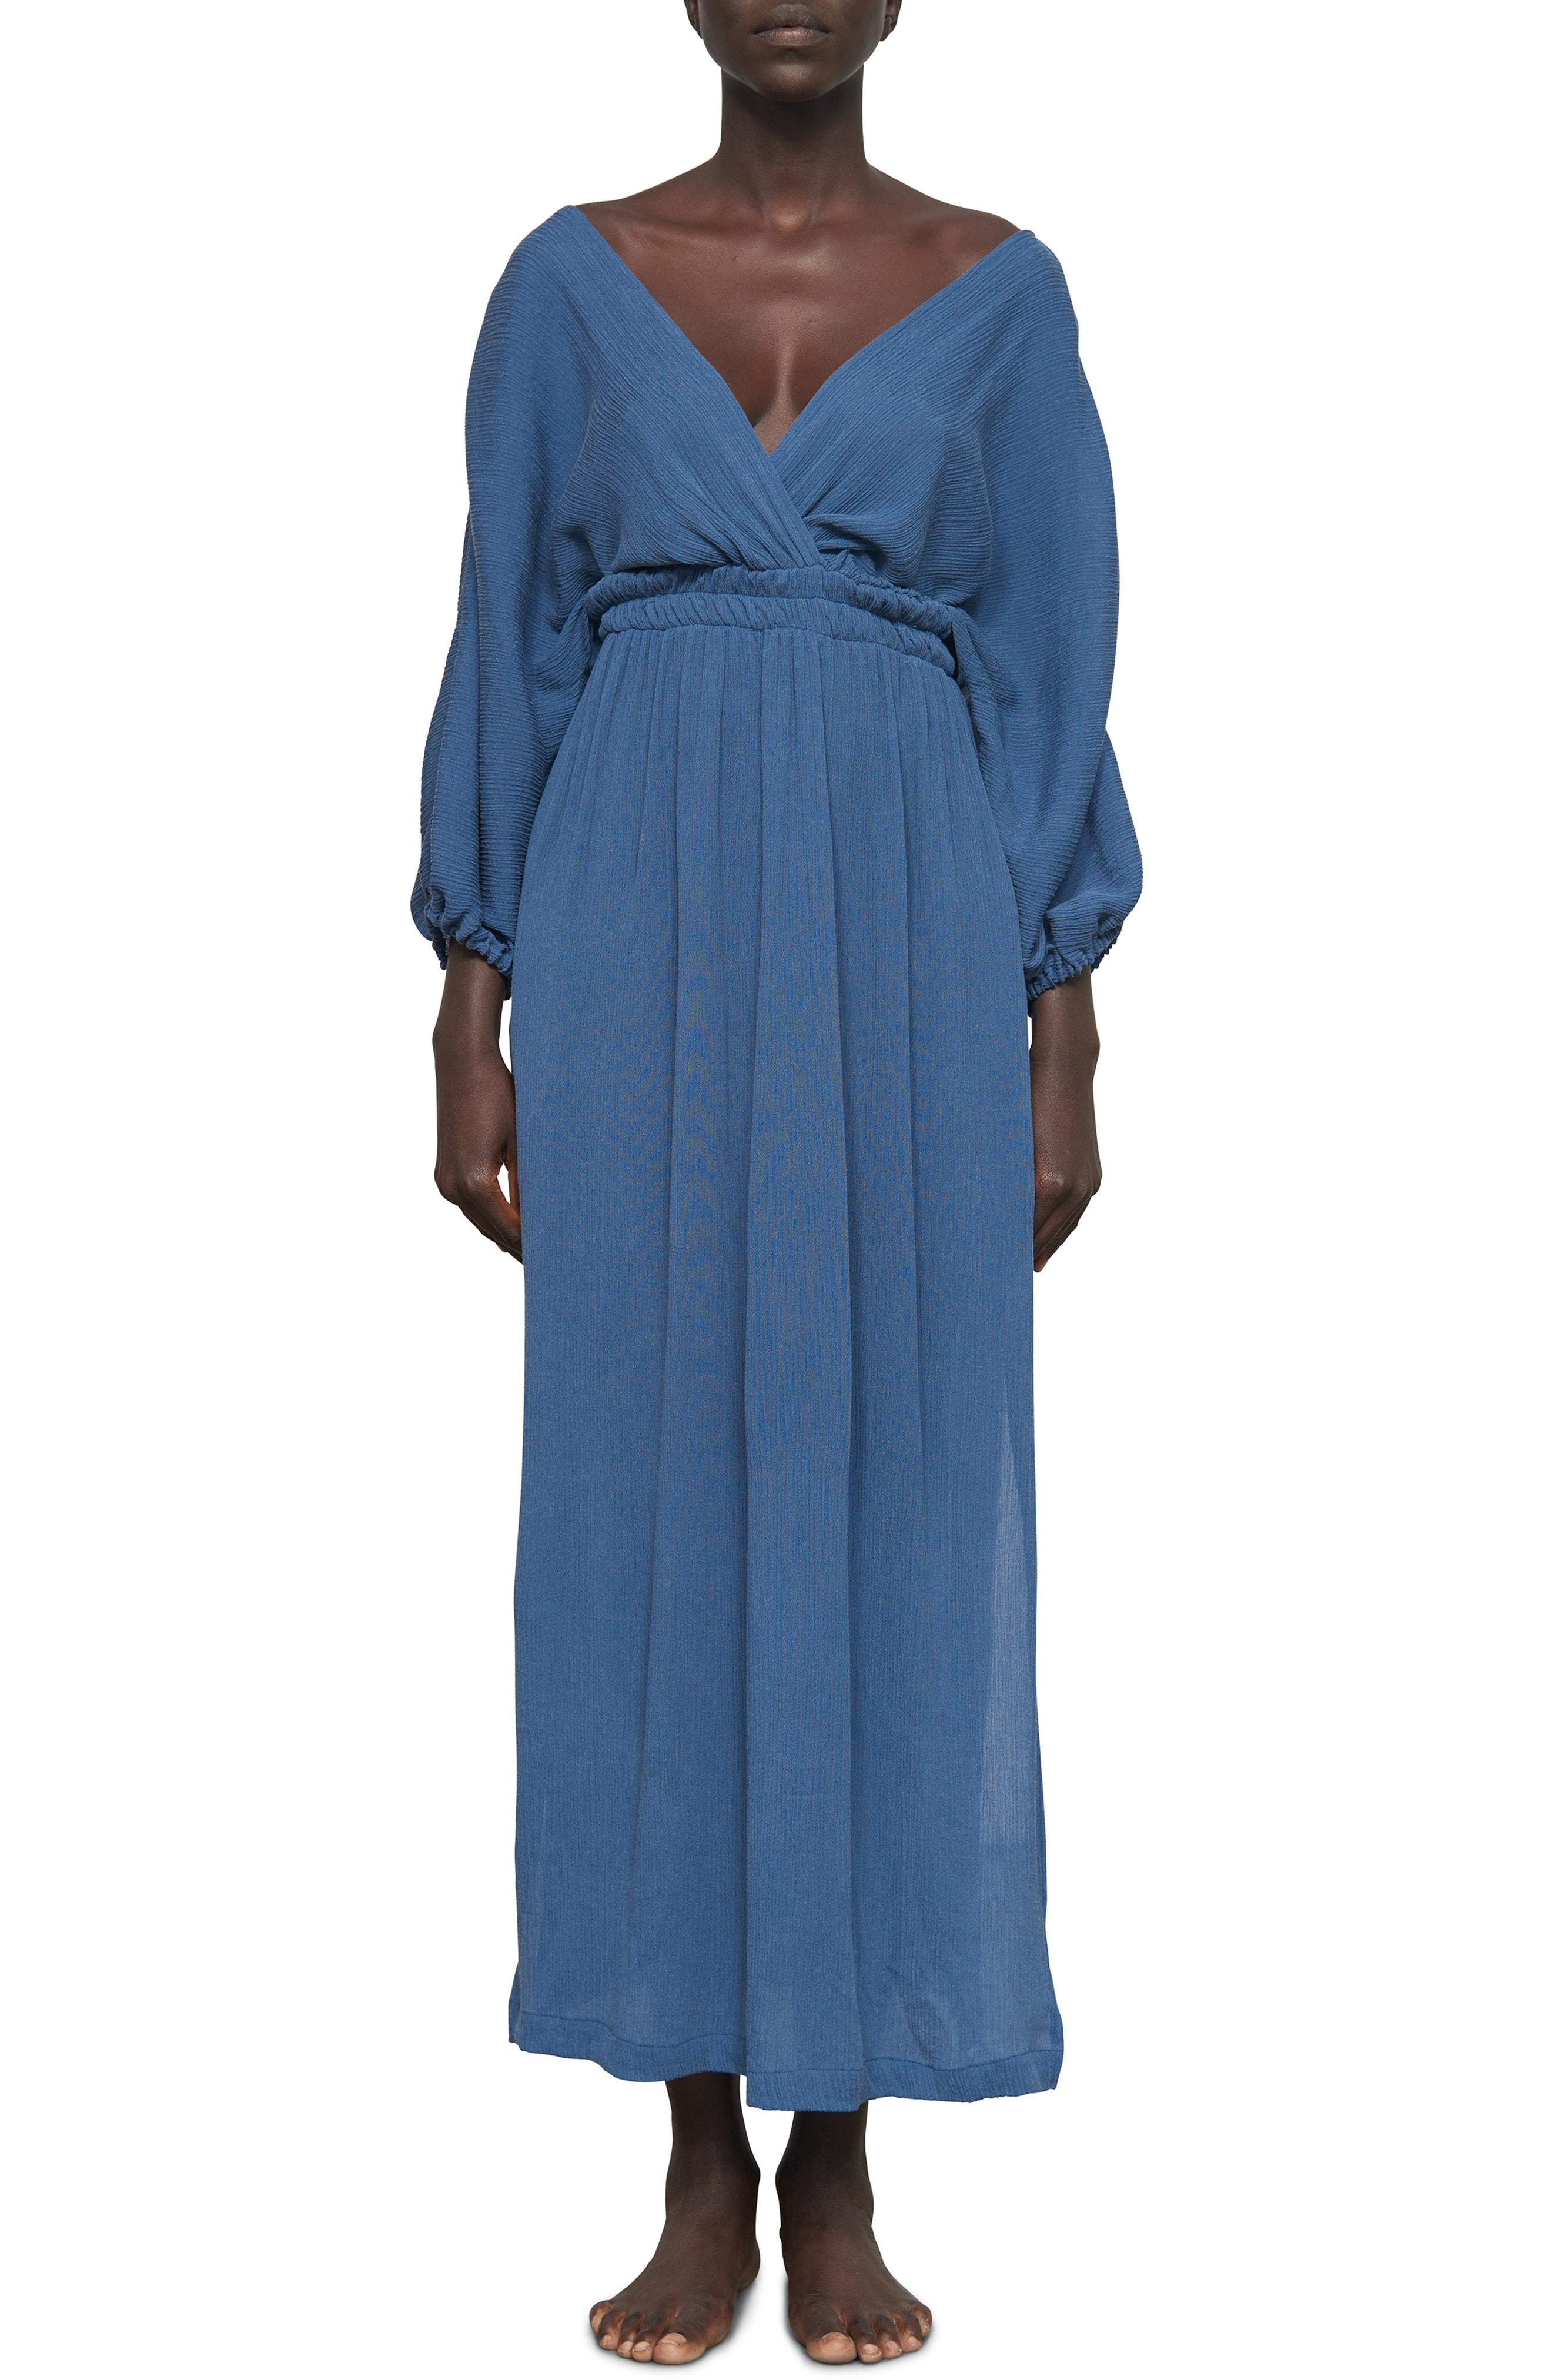 6c1d4084a5f Lyst - Mara Hoffman Nami Cover-up Maxi Dress in Blue